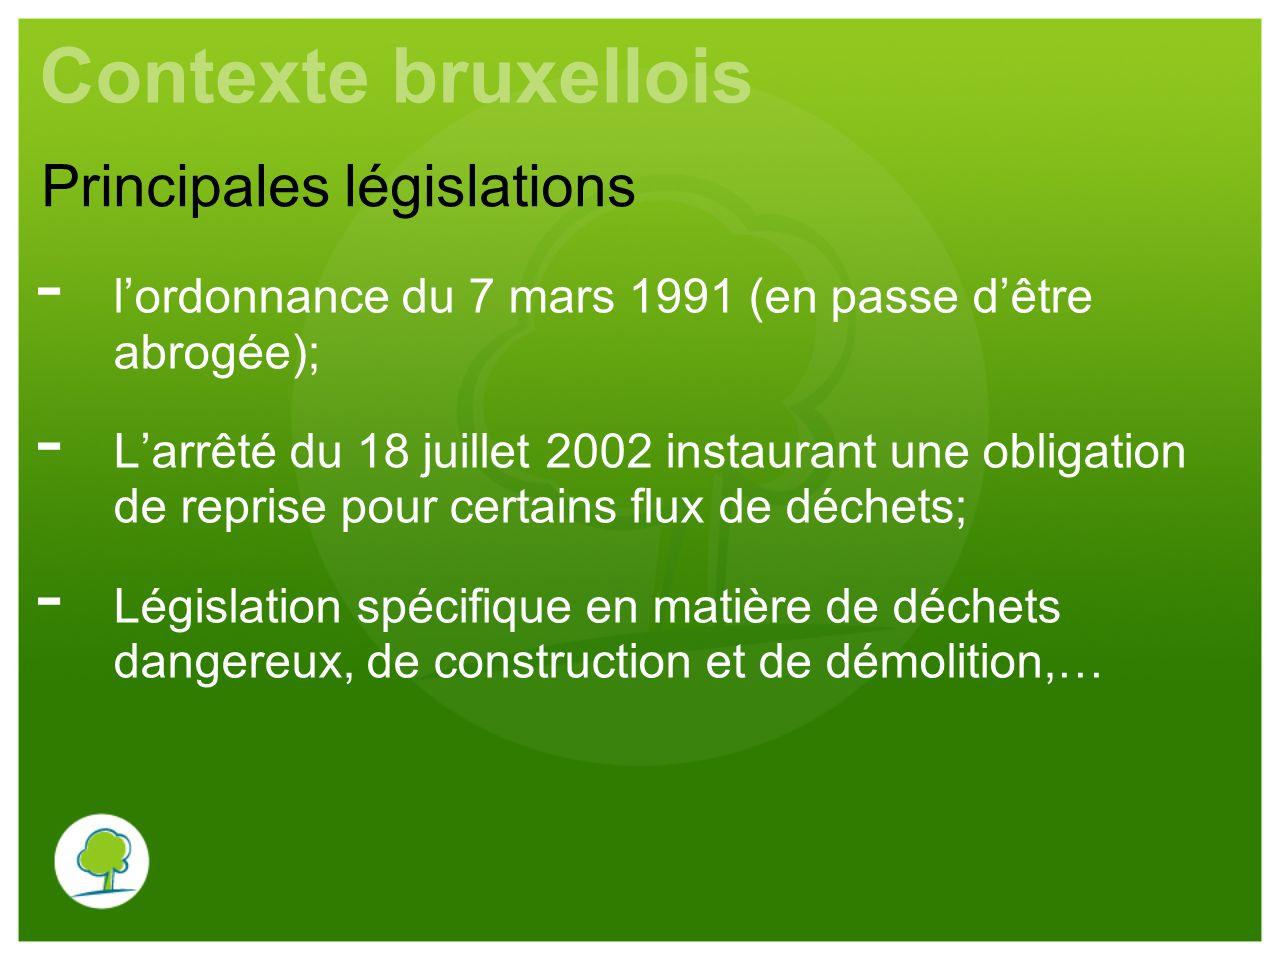 Contexte bruxellois Principales législations